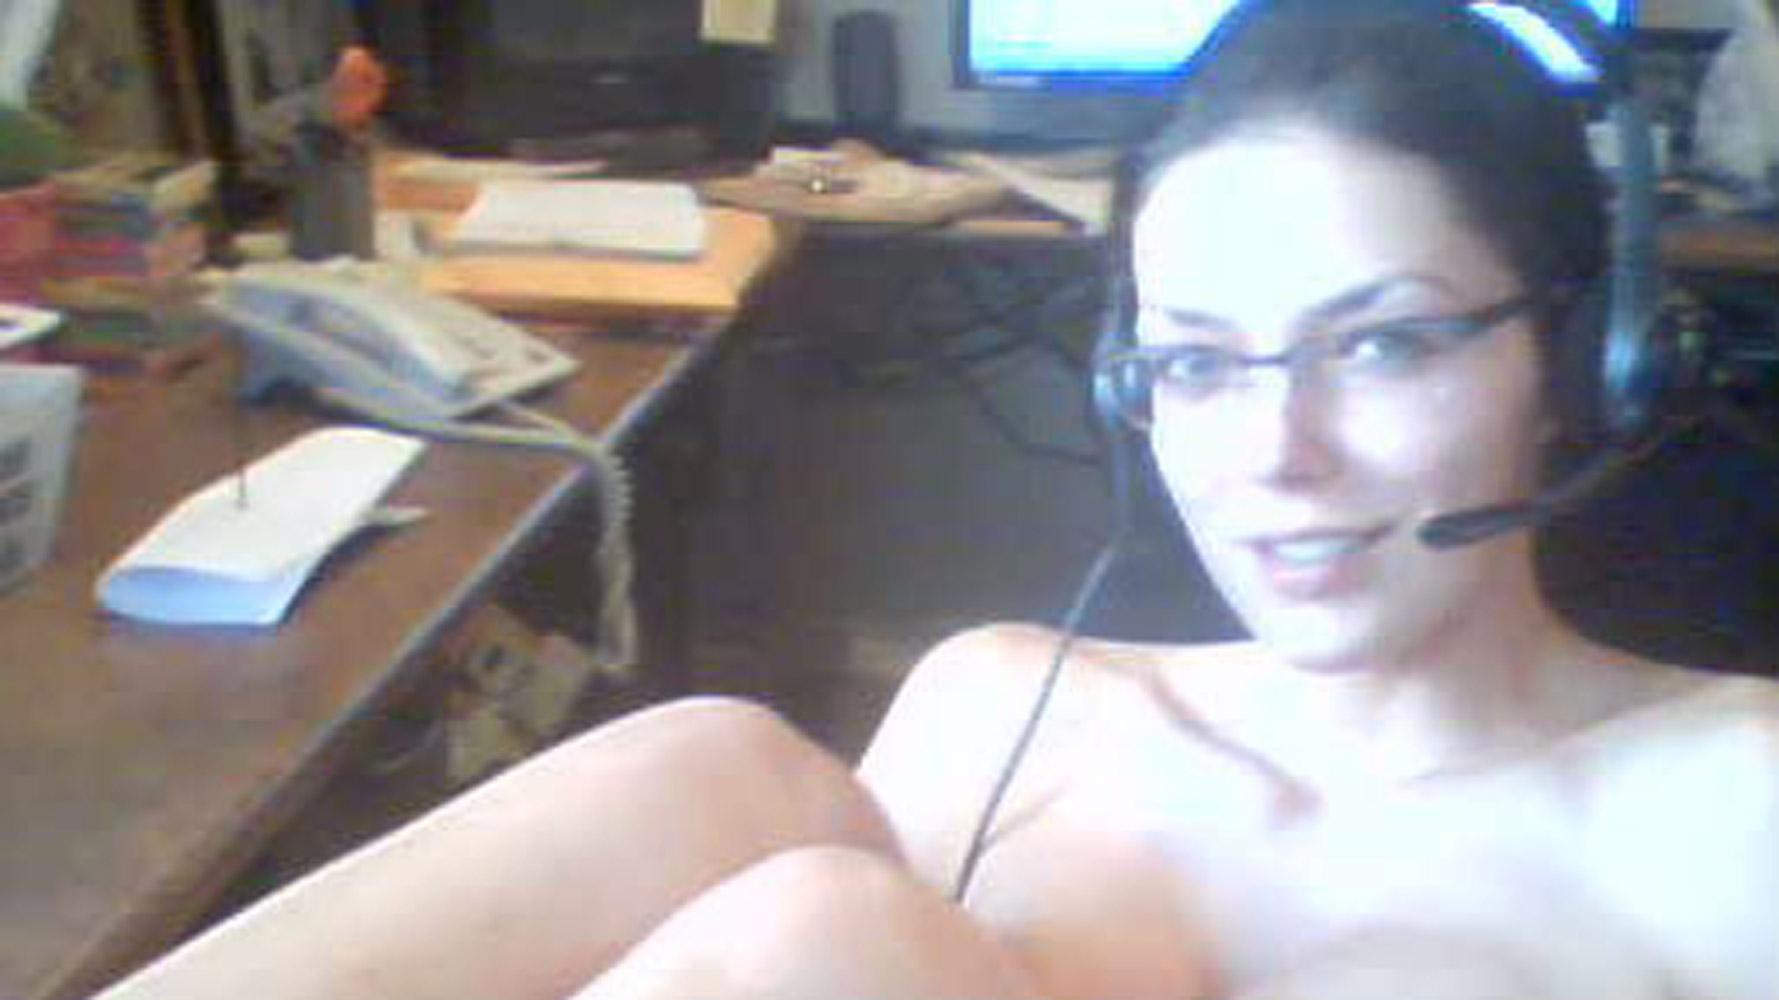 Warcrat nude mod xxx video